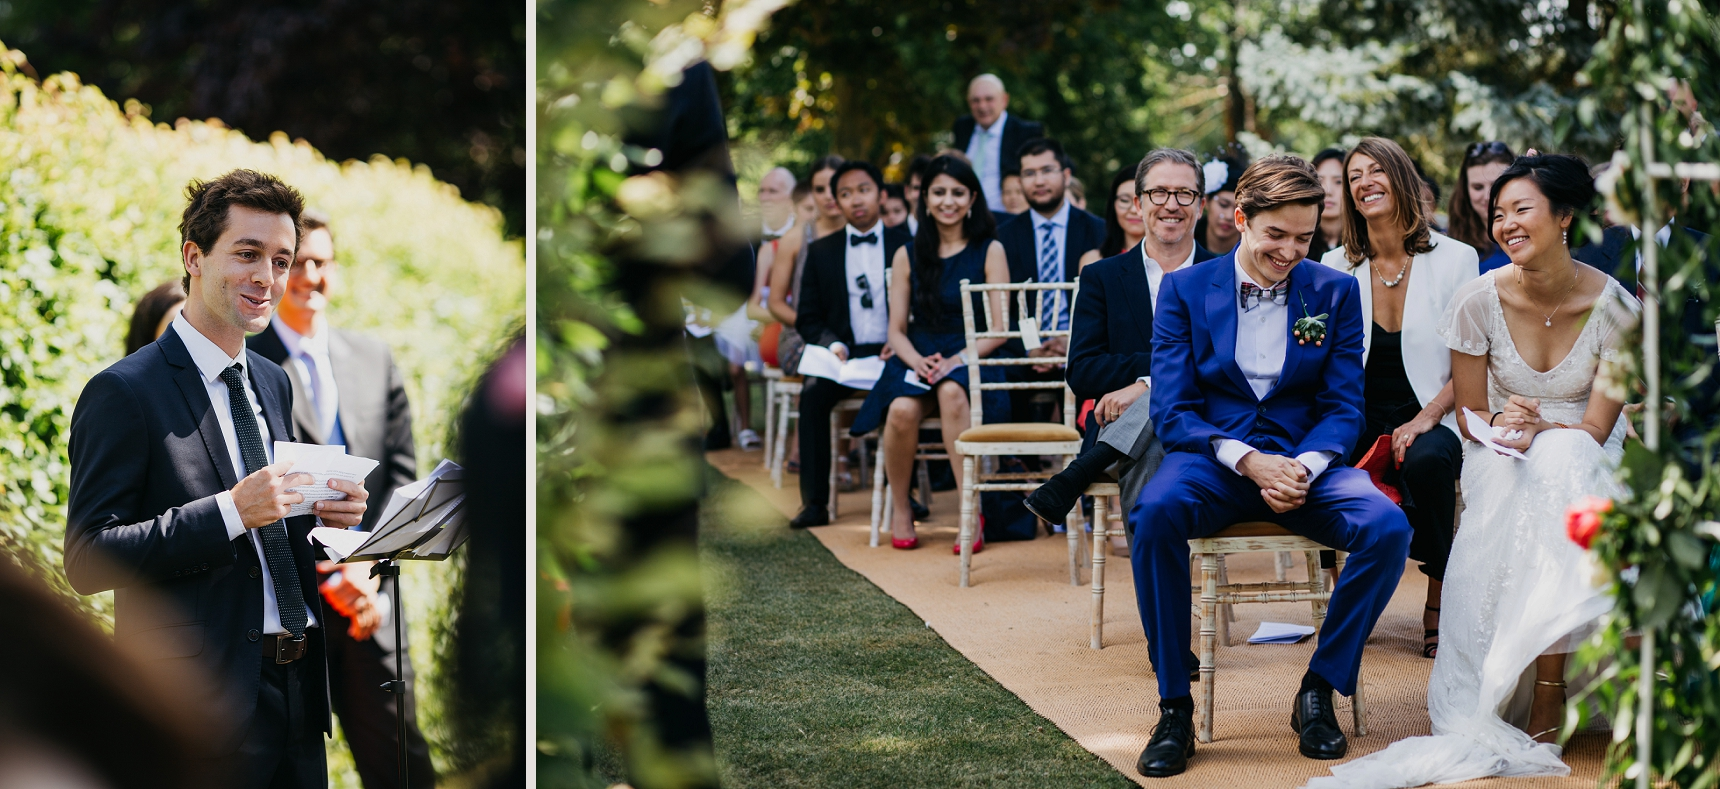 outdoor ceremony weddings The Manor Barn Harlton